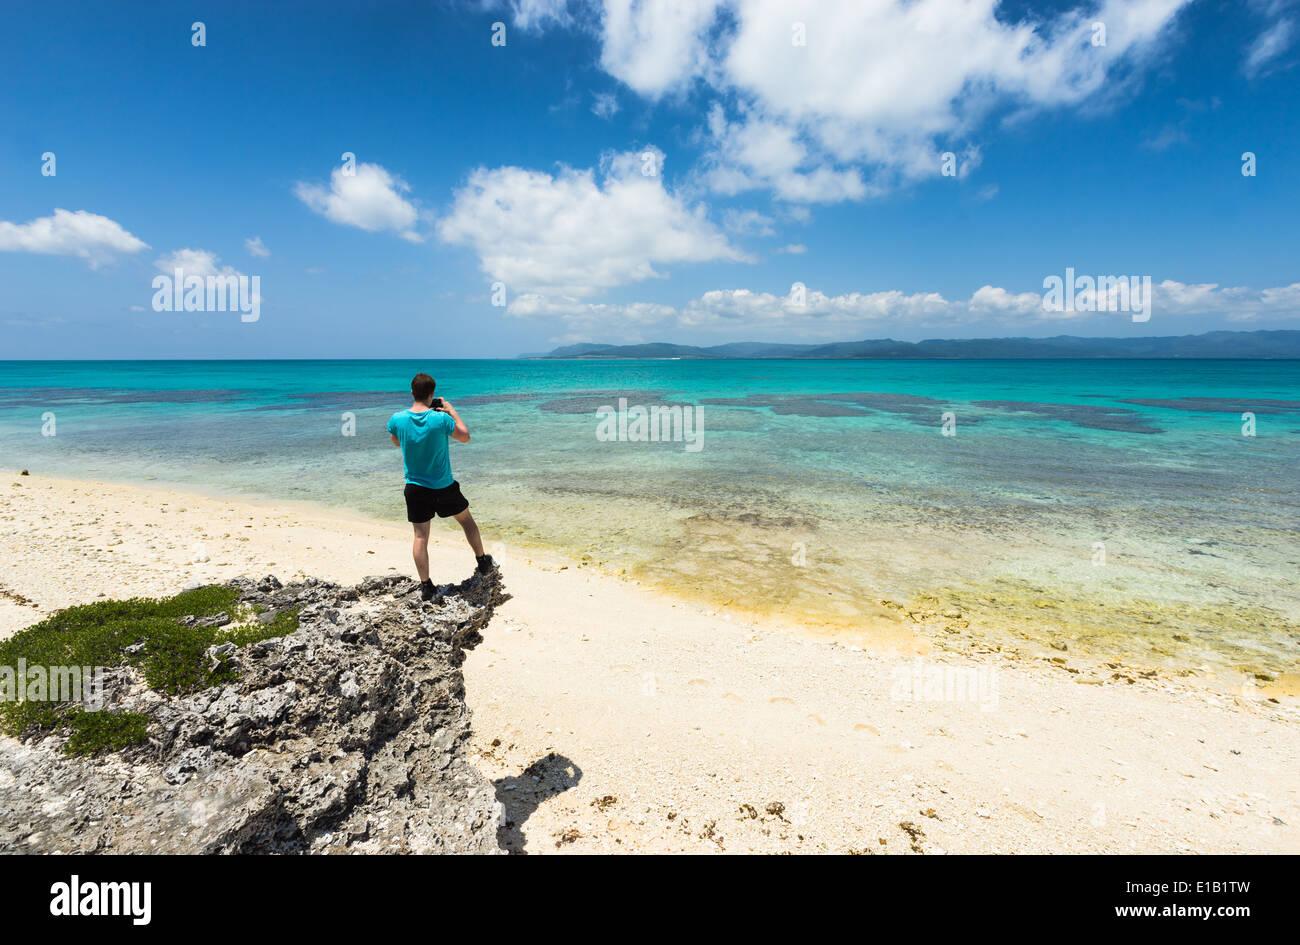 Man taking photo of stunning white sand tropical beach full of healthy coral, Yaeyama islands, Okinawa, Japan - Stock Image